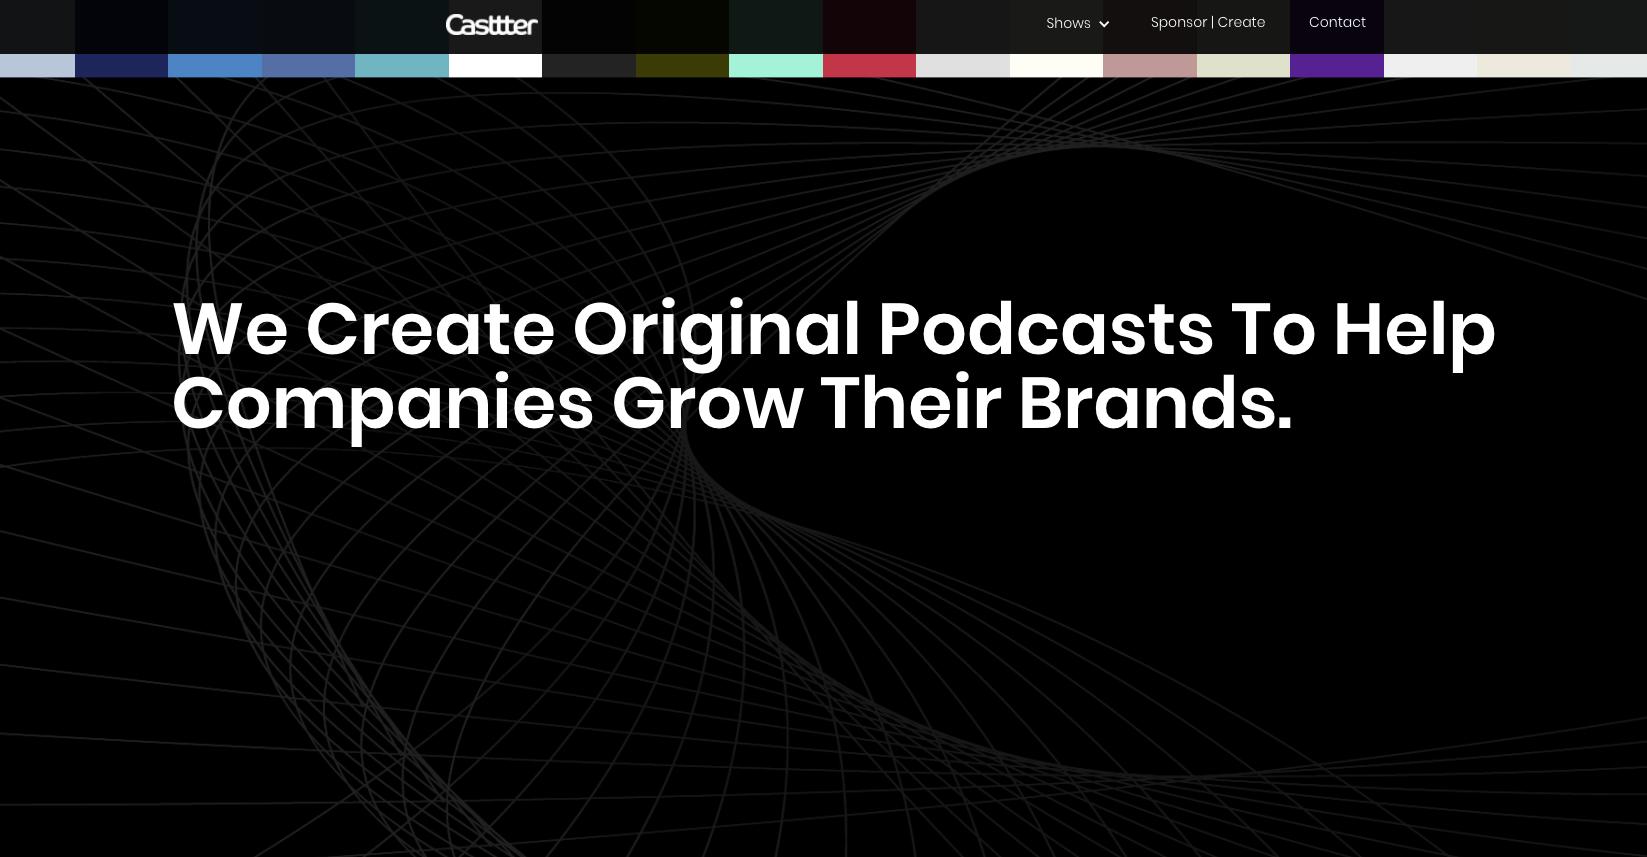 Orange Cattle | Creative Advertising for Small Businesses  | Houston, Dallas, Lufkin